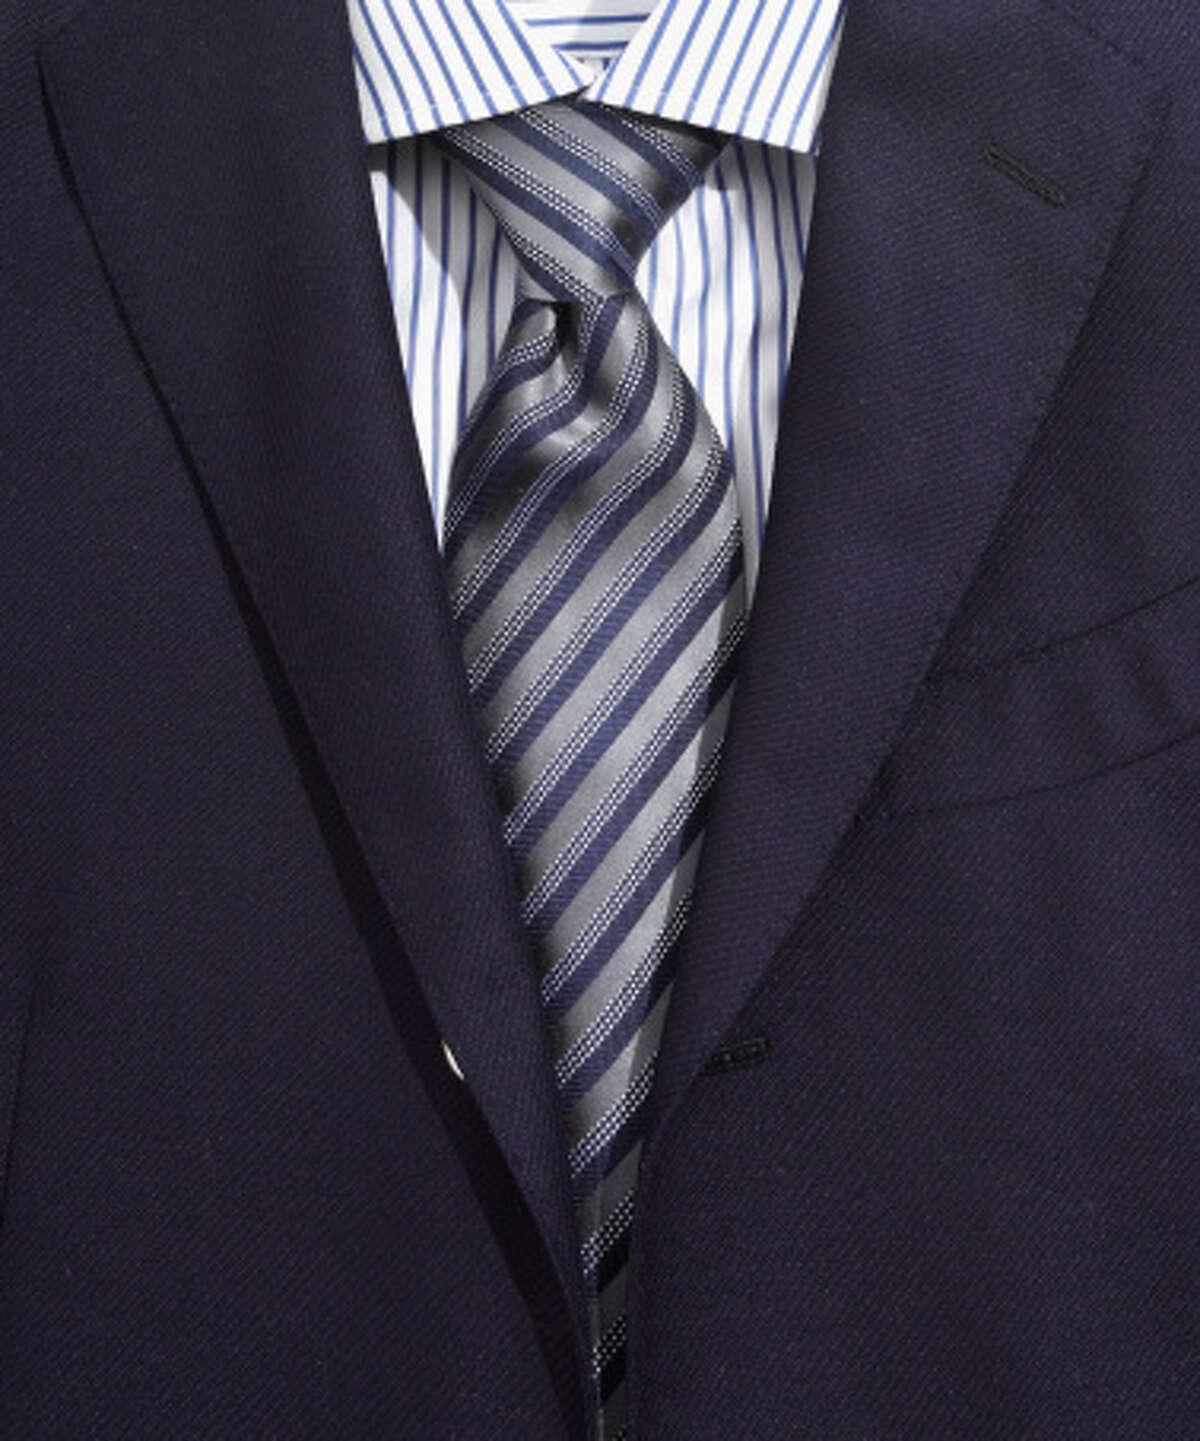 Suits, slacks, jackets